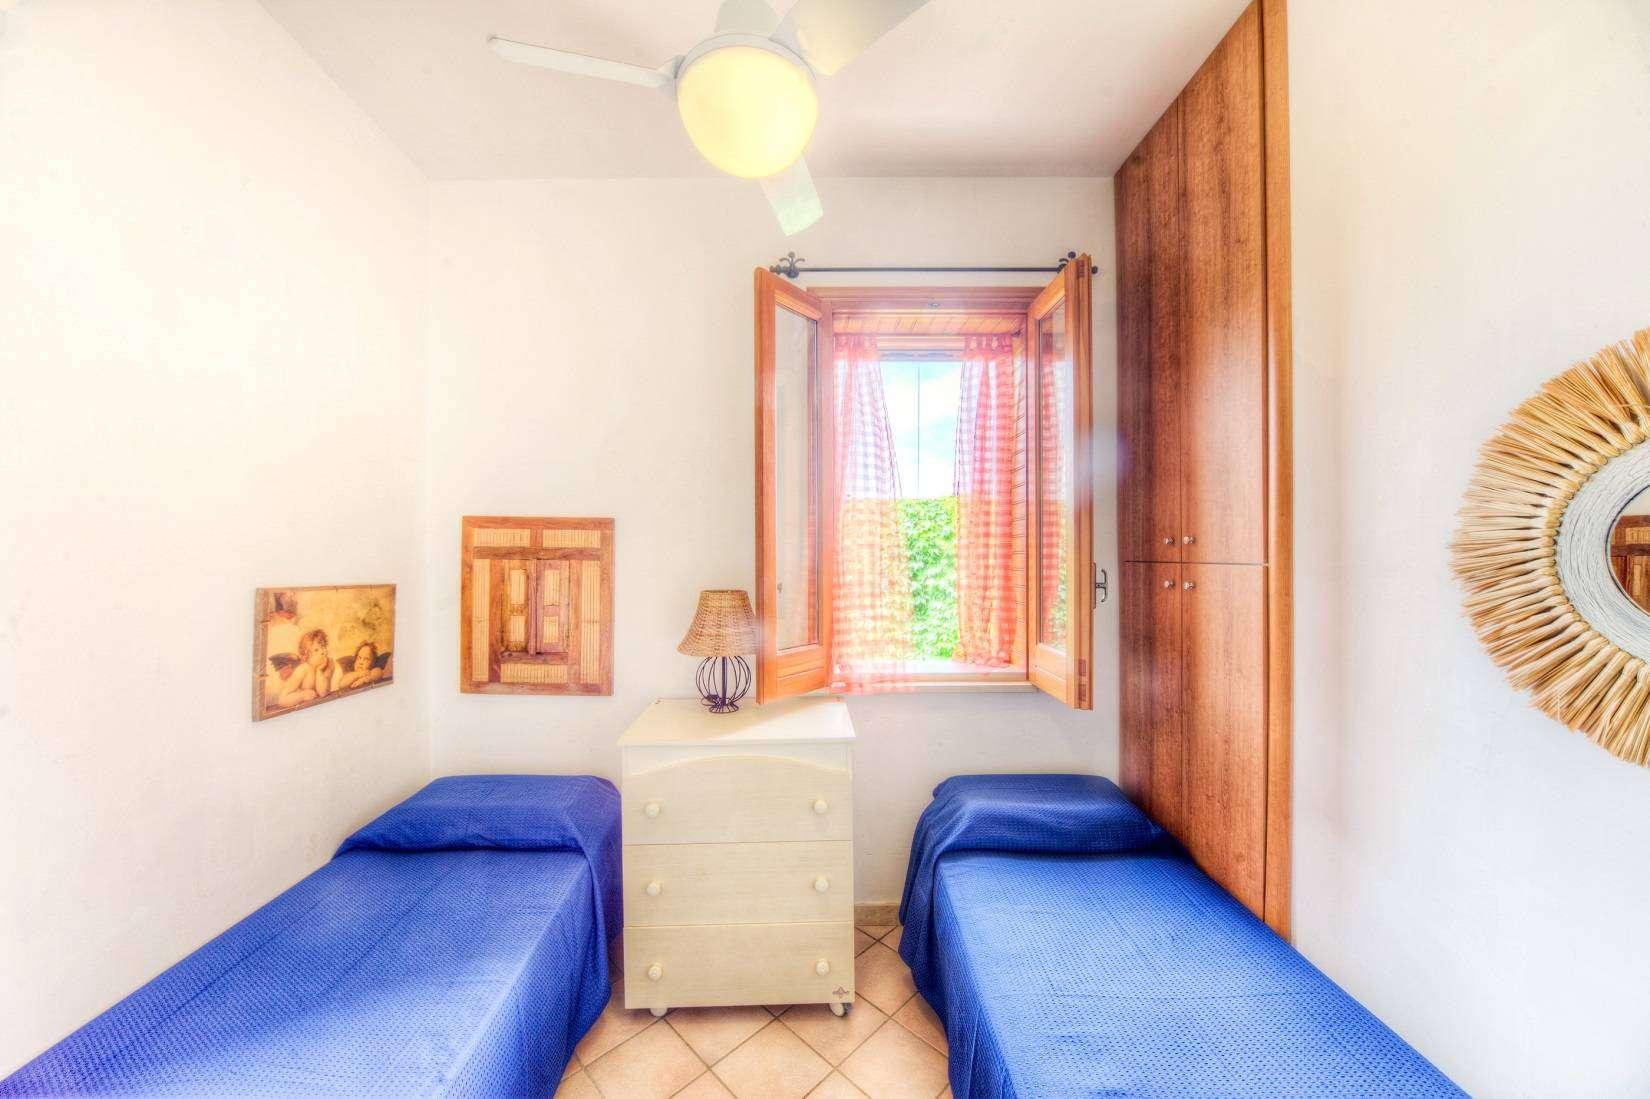 14 Brucarella Twin bedroom